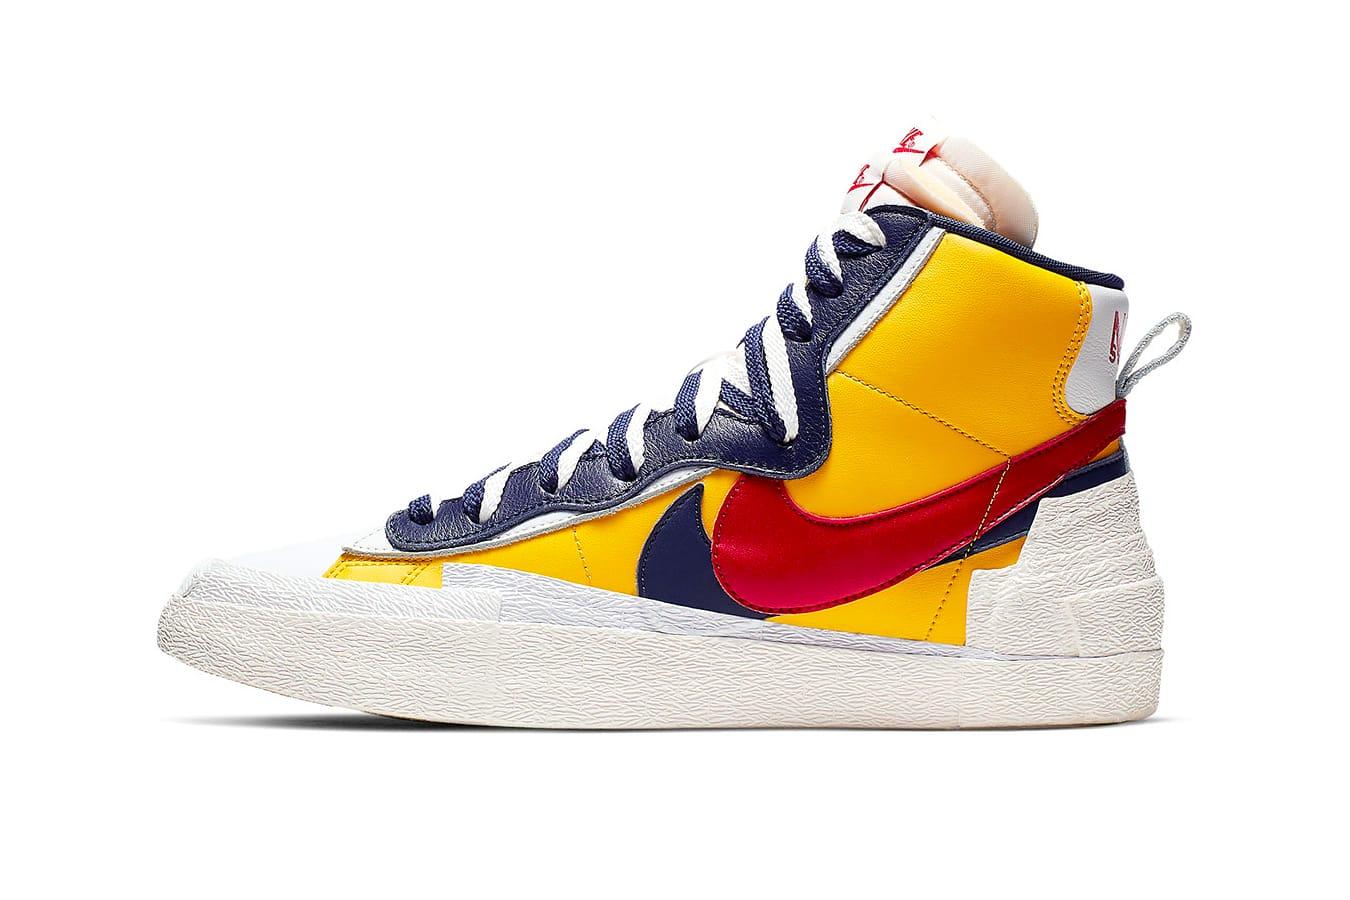 sacai x Nike Blazer High Pack Release